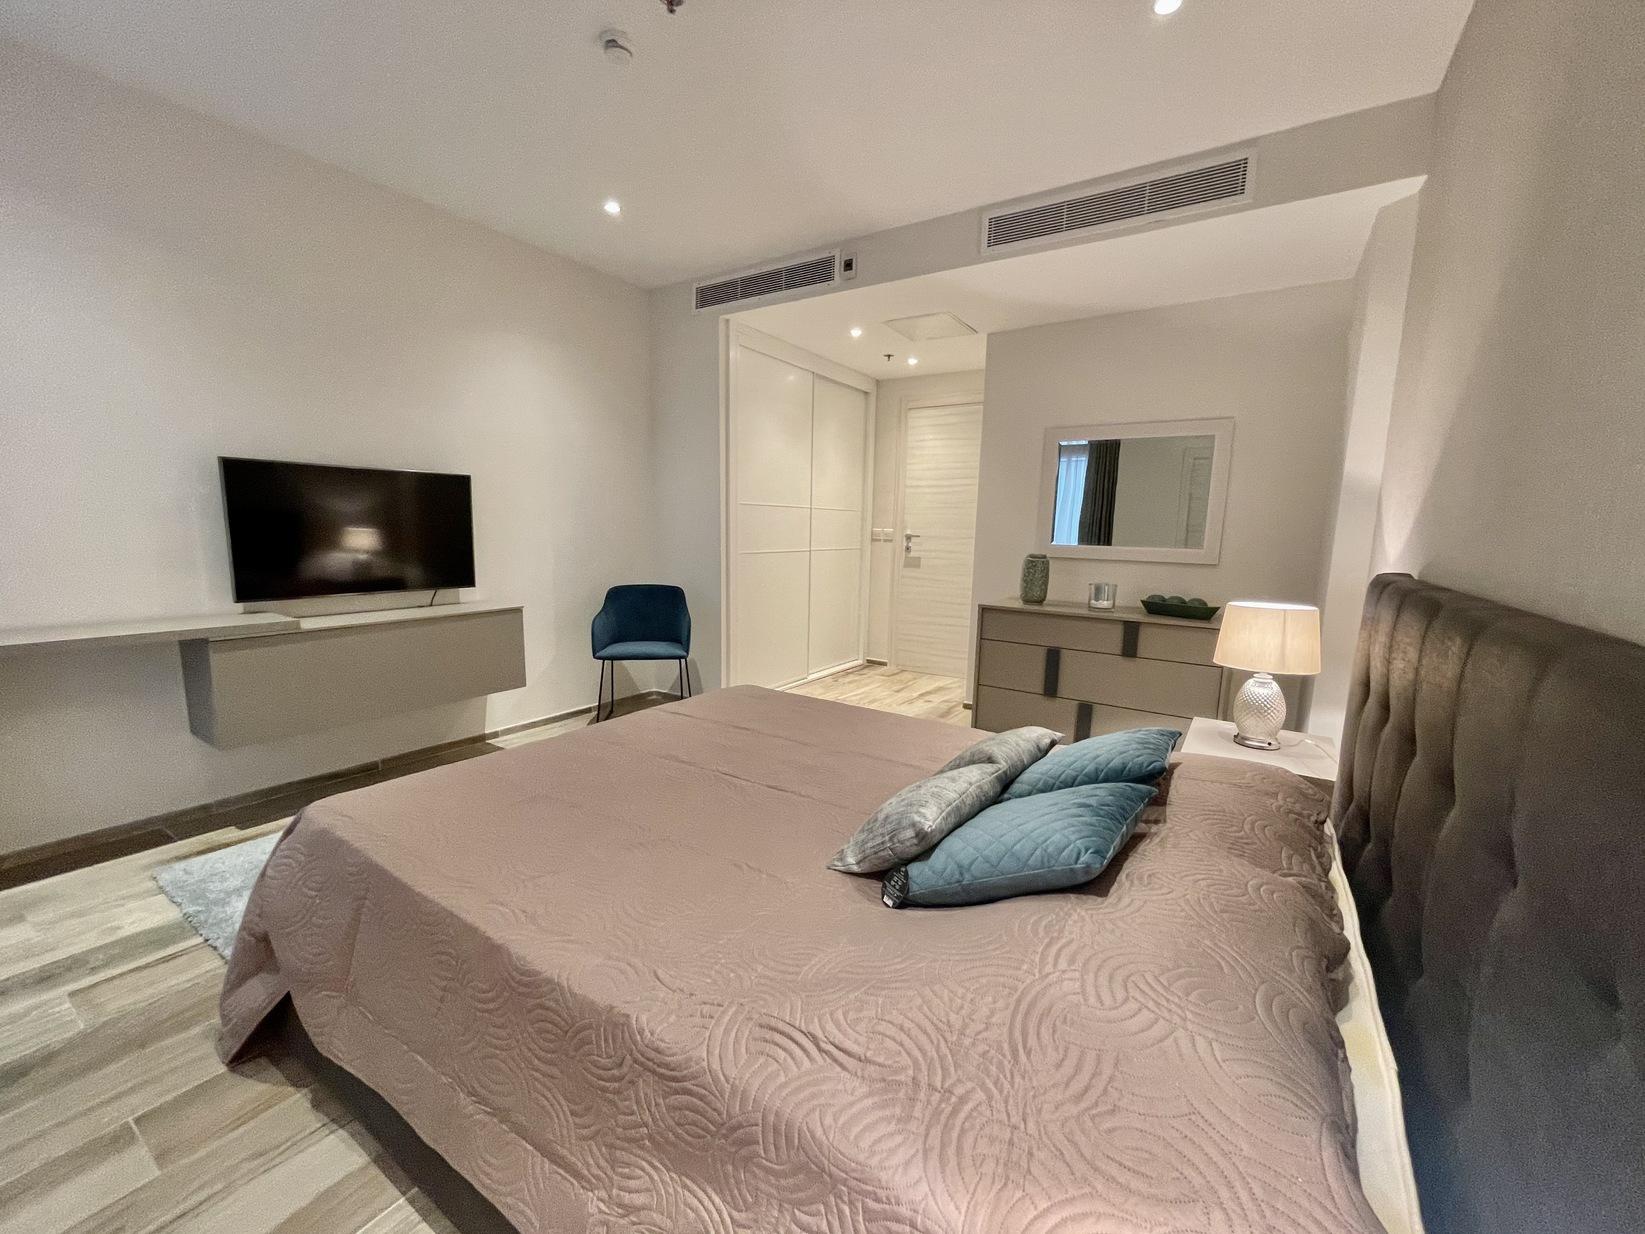 2 bed Apartment For Rent in Sliema, Sliema - thumb 19